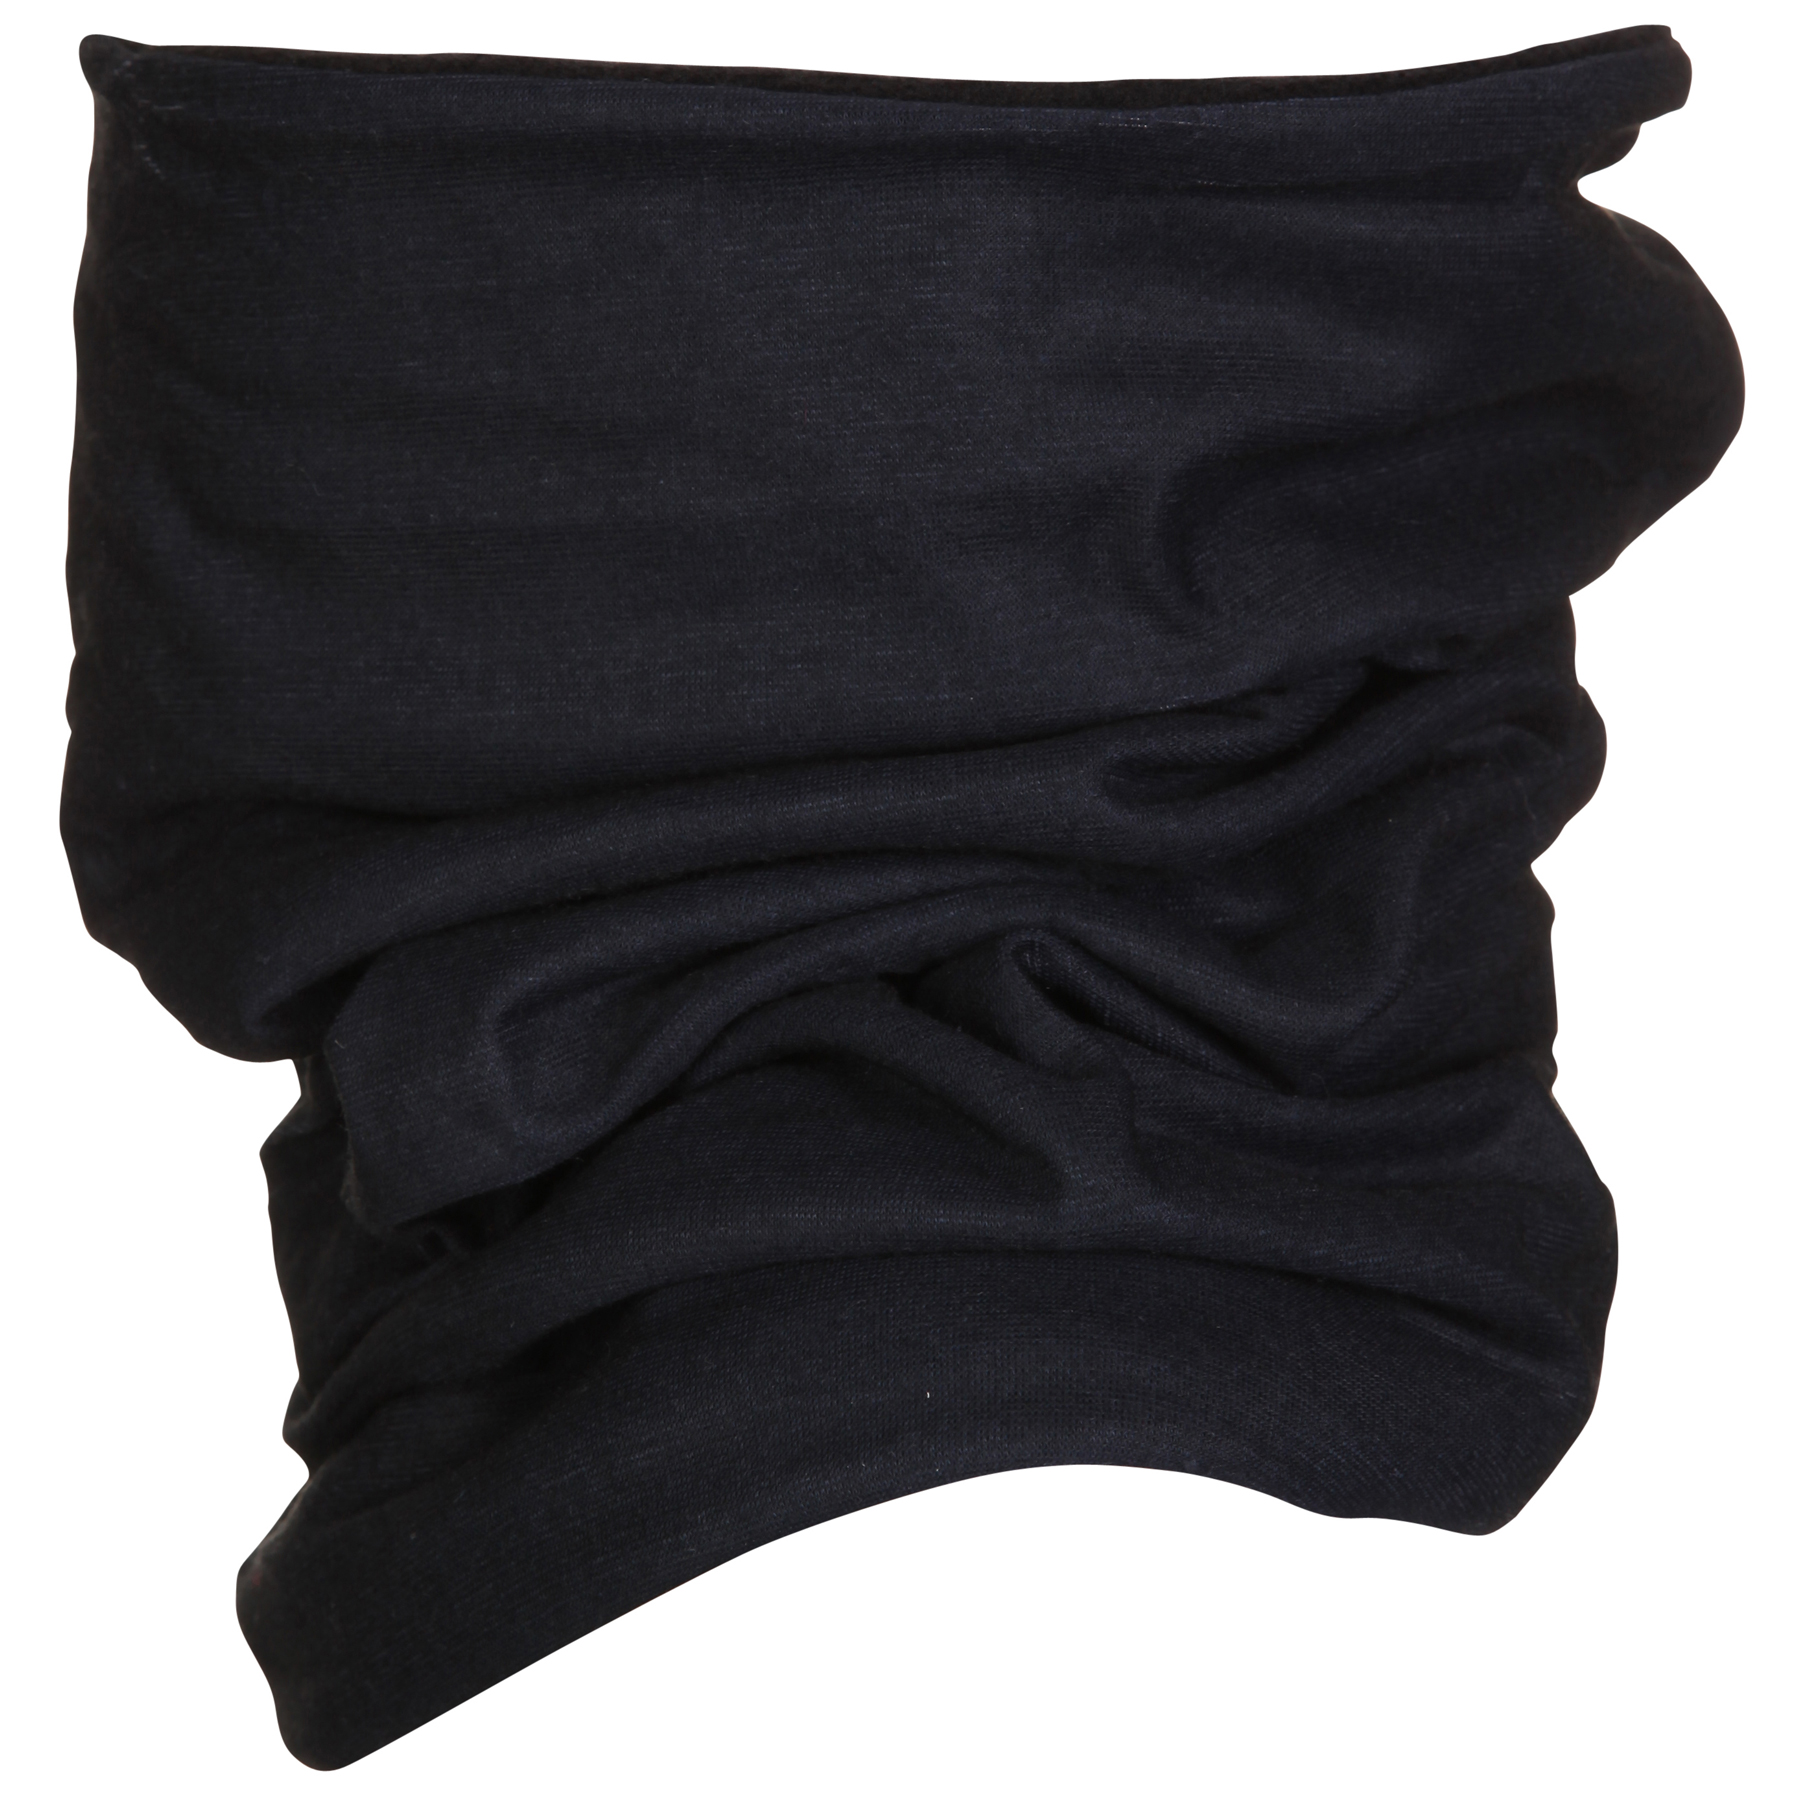 Produktbild von Regatta Adults Multitube II Multifunktionstuch - 800 Black